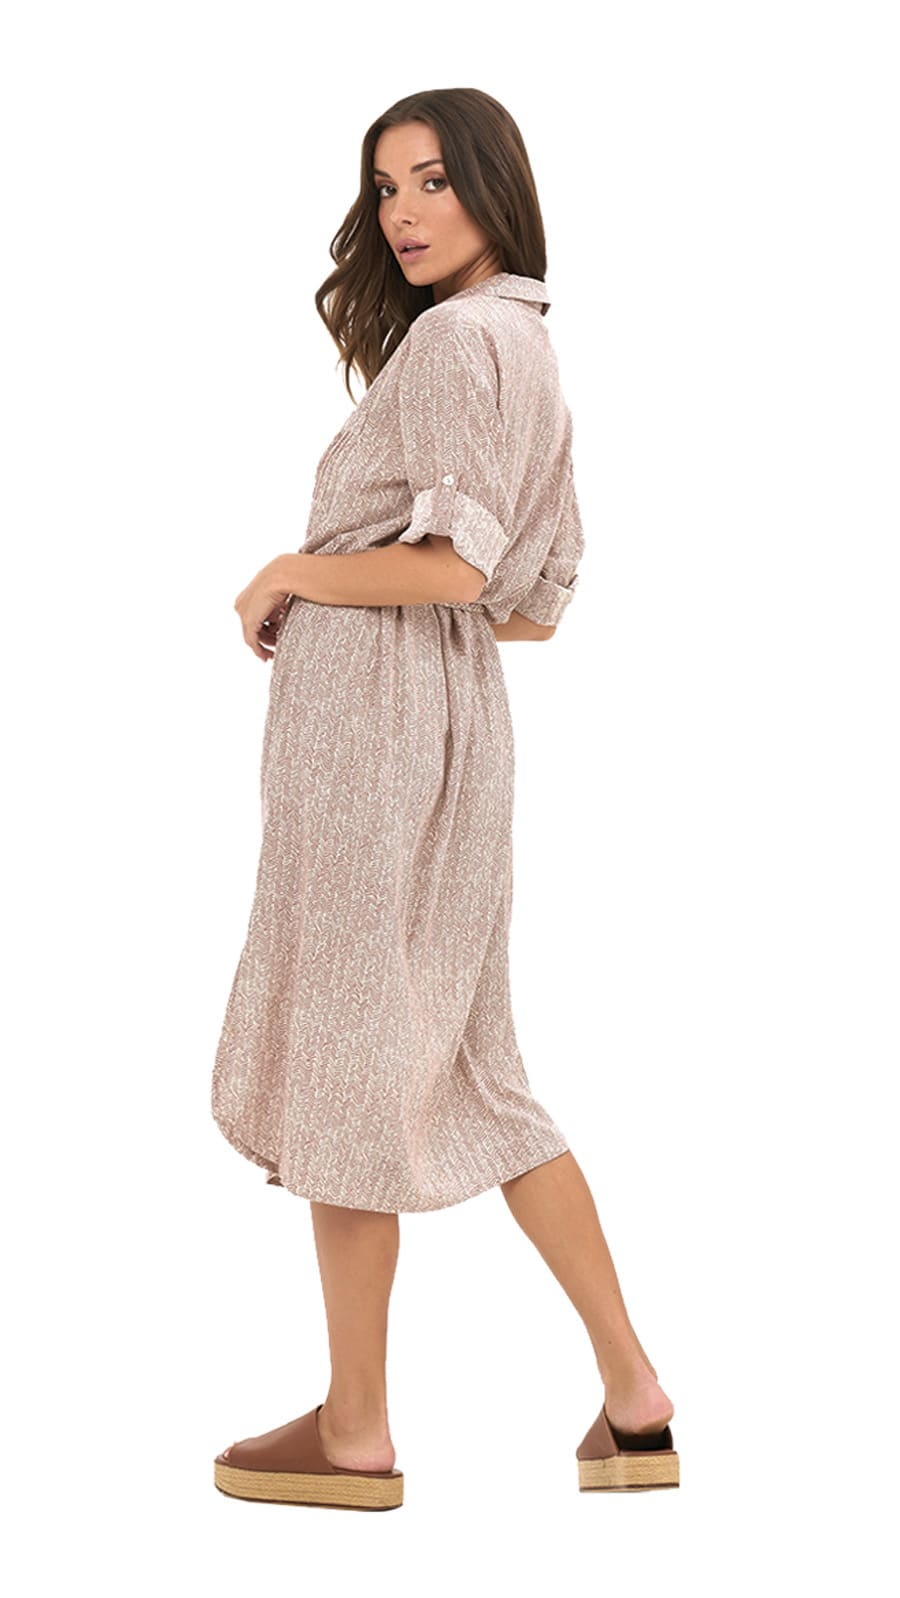 Amandy Dress - Birch-Dust - Back